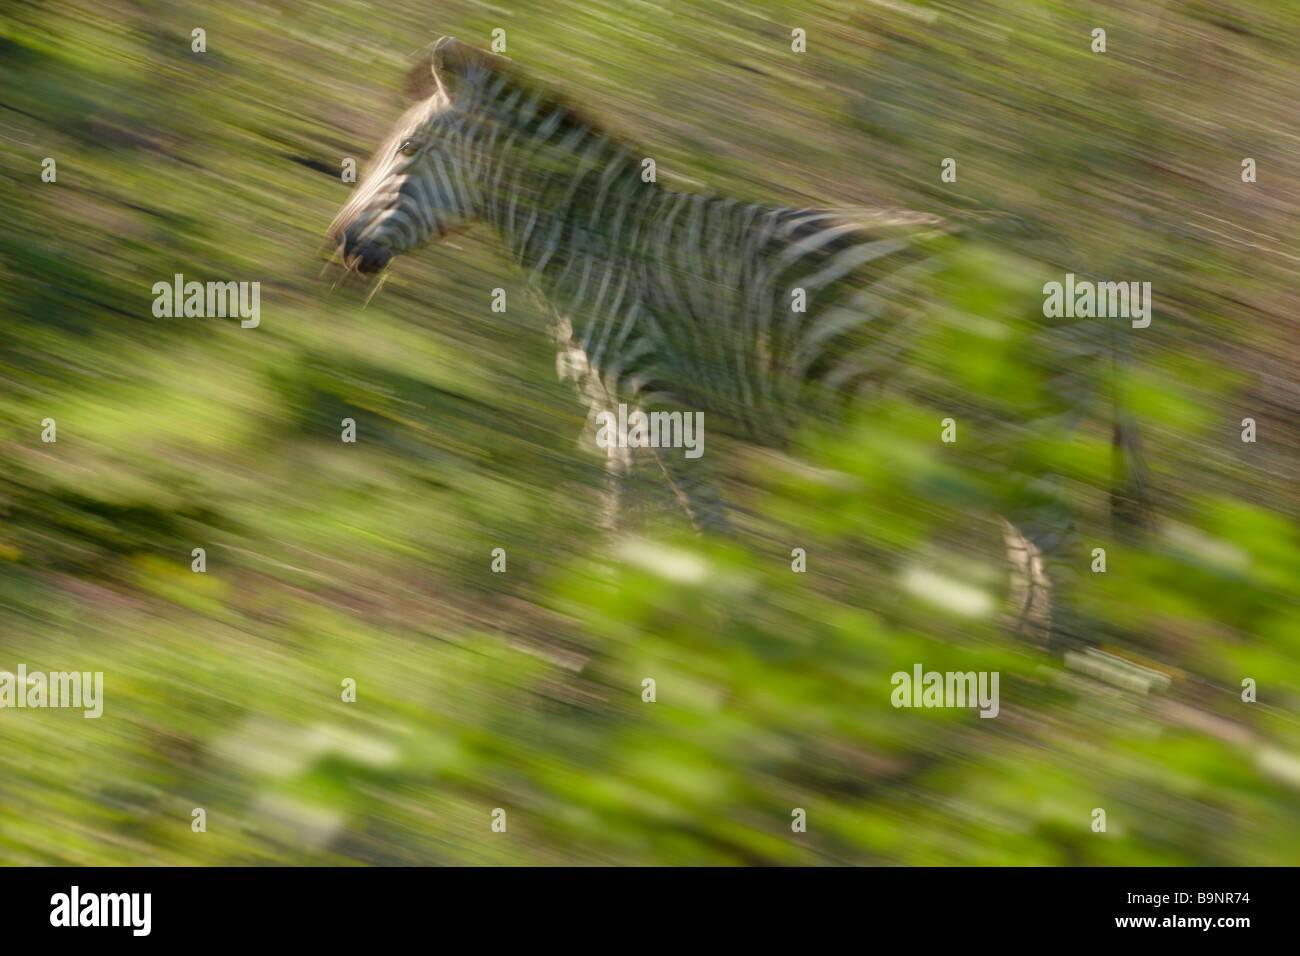 Burchells solitario zebra sull'spostare, Kruger National Park, Sud Africa Immagini Stock